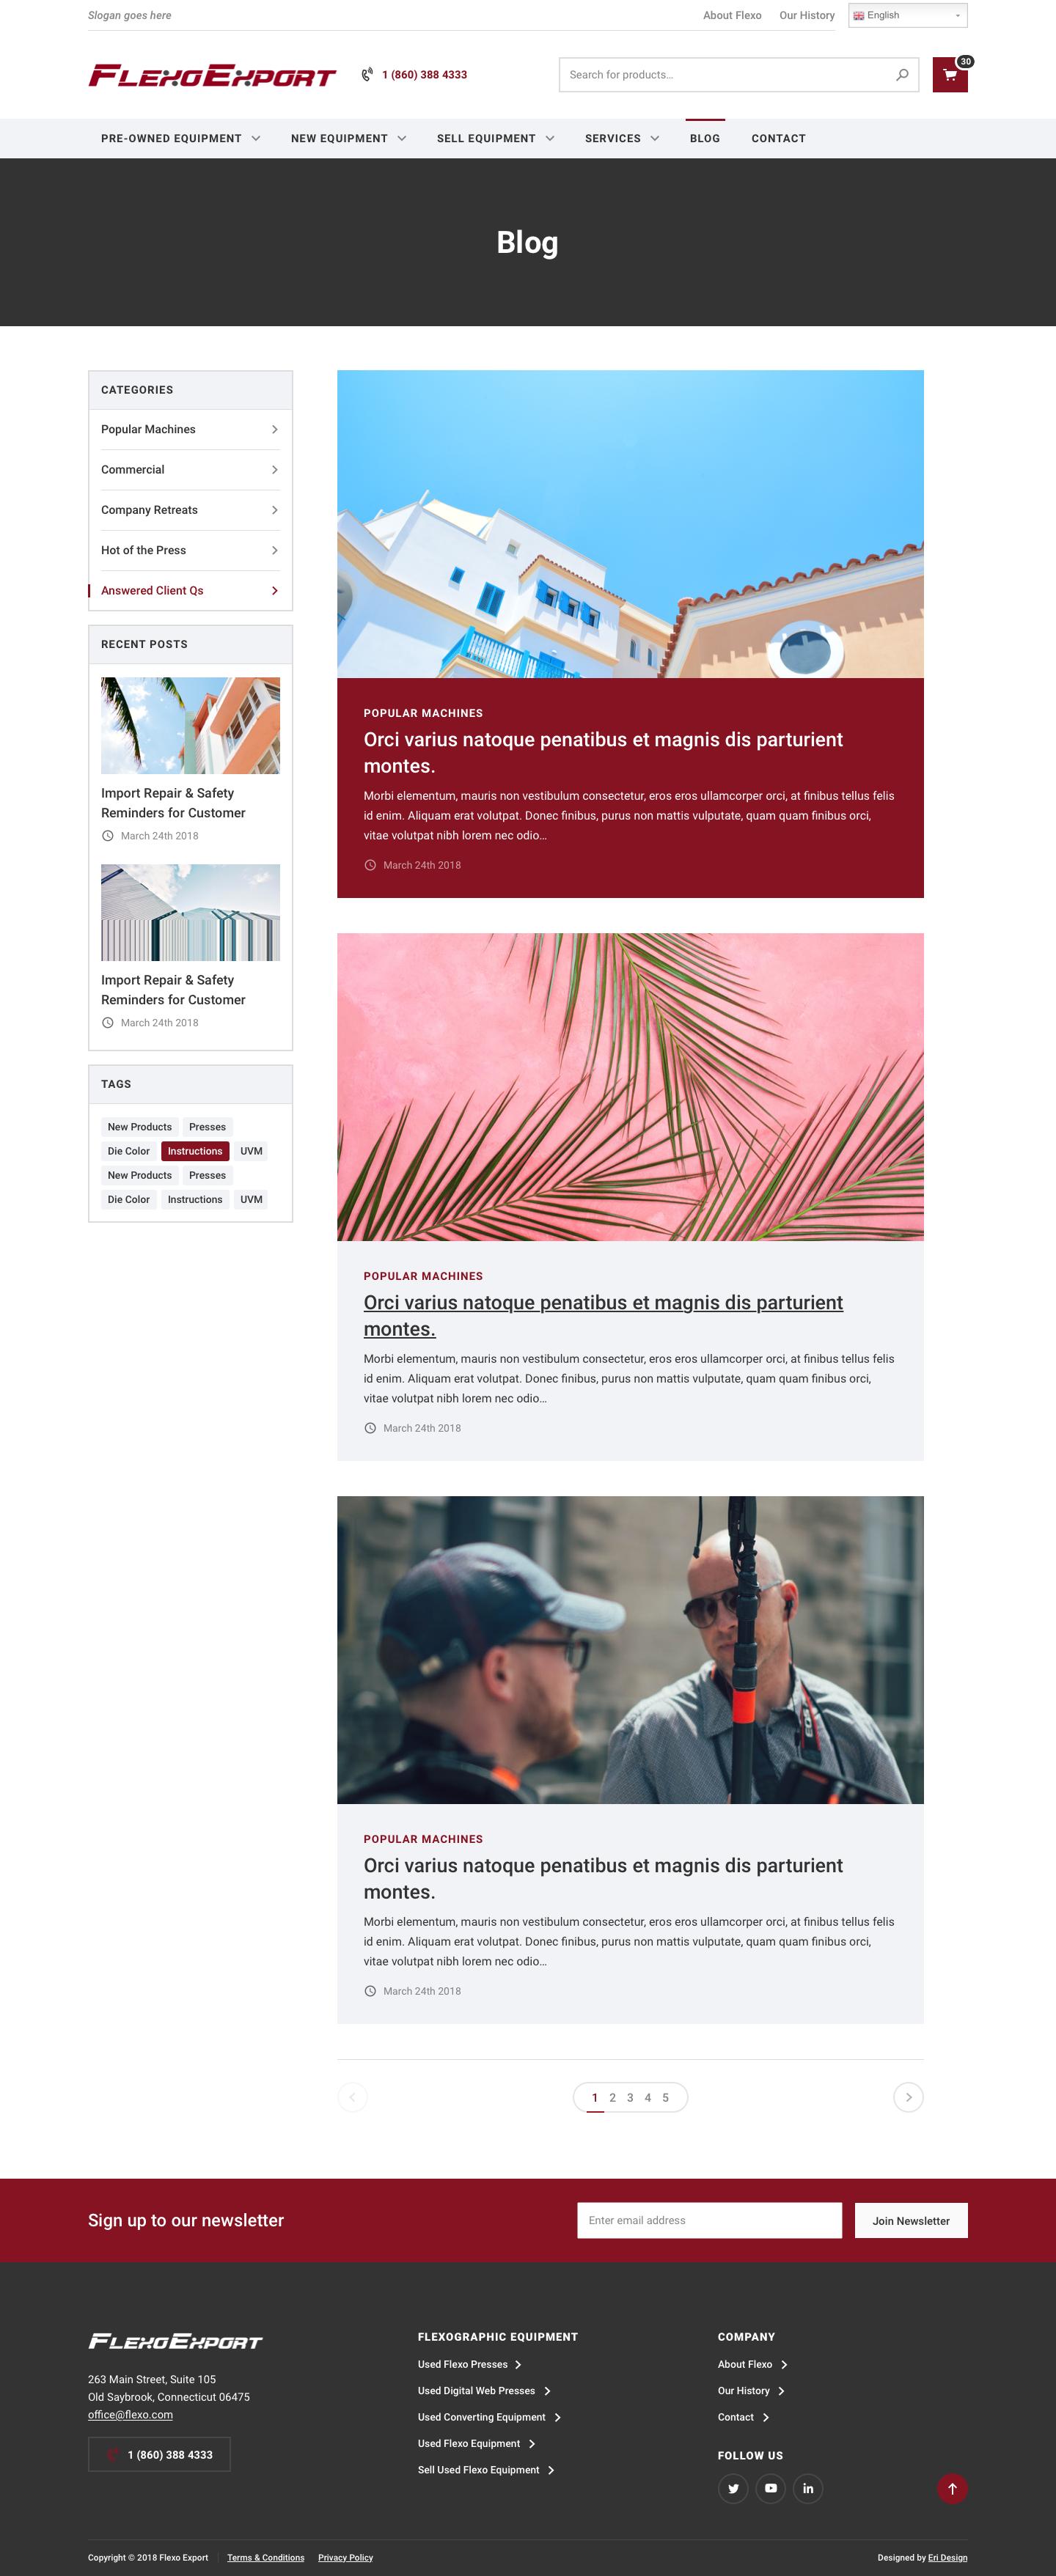 FlexoExport blog landing page design